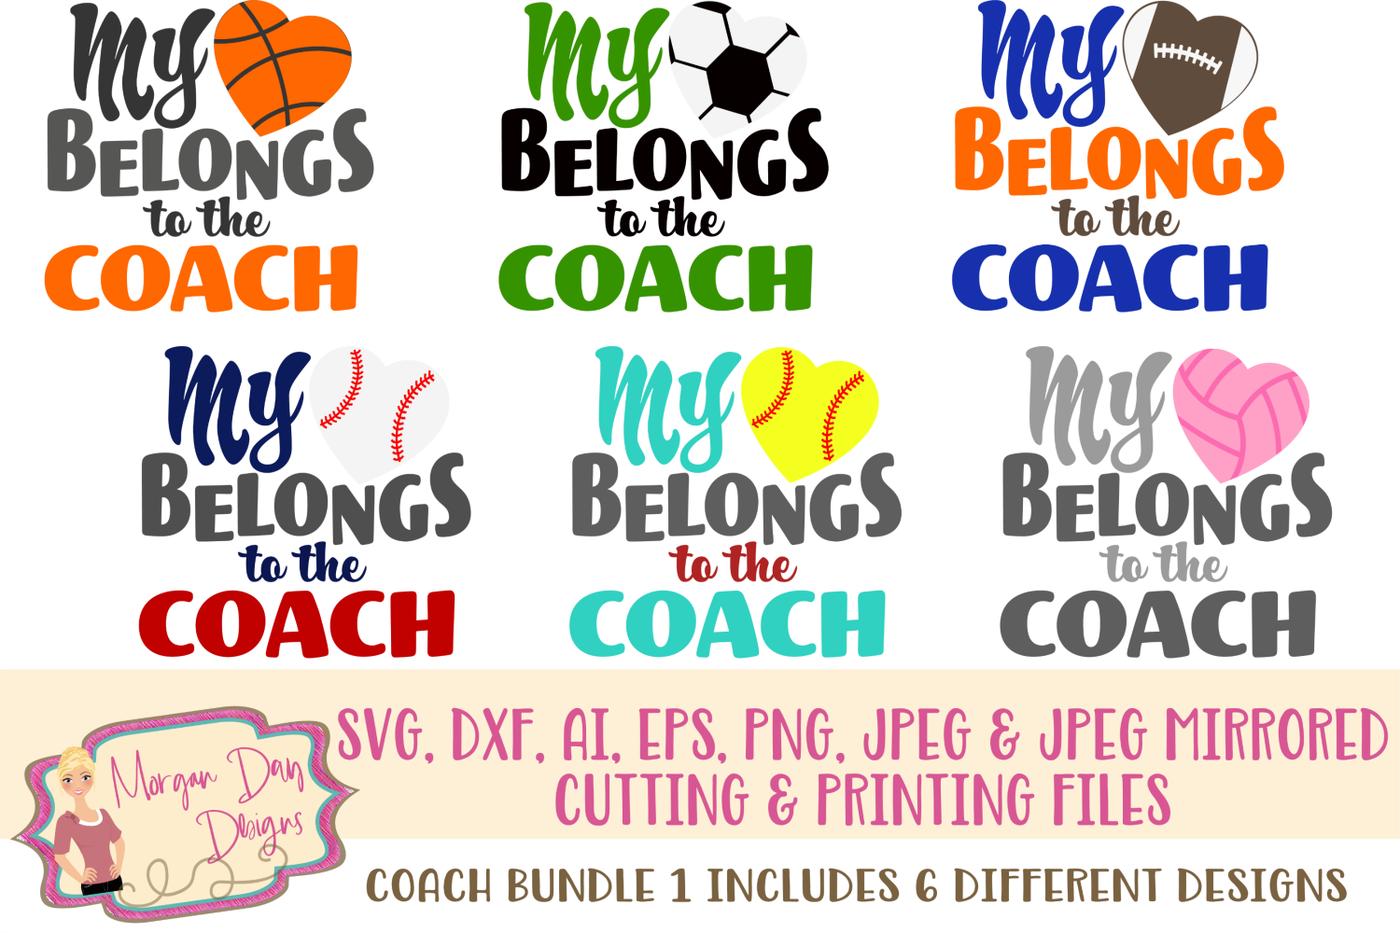 My Heart Belongs To Coach Svg Bundle By Morgan Day Designs